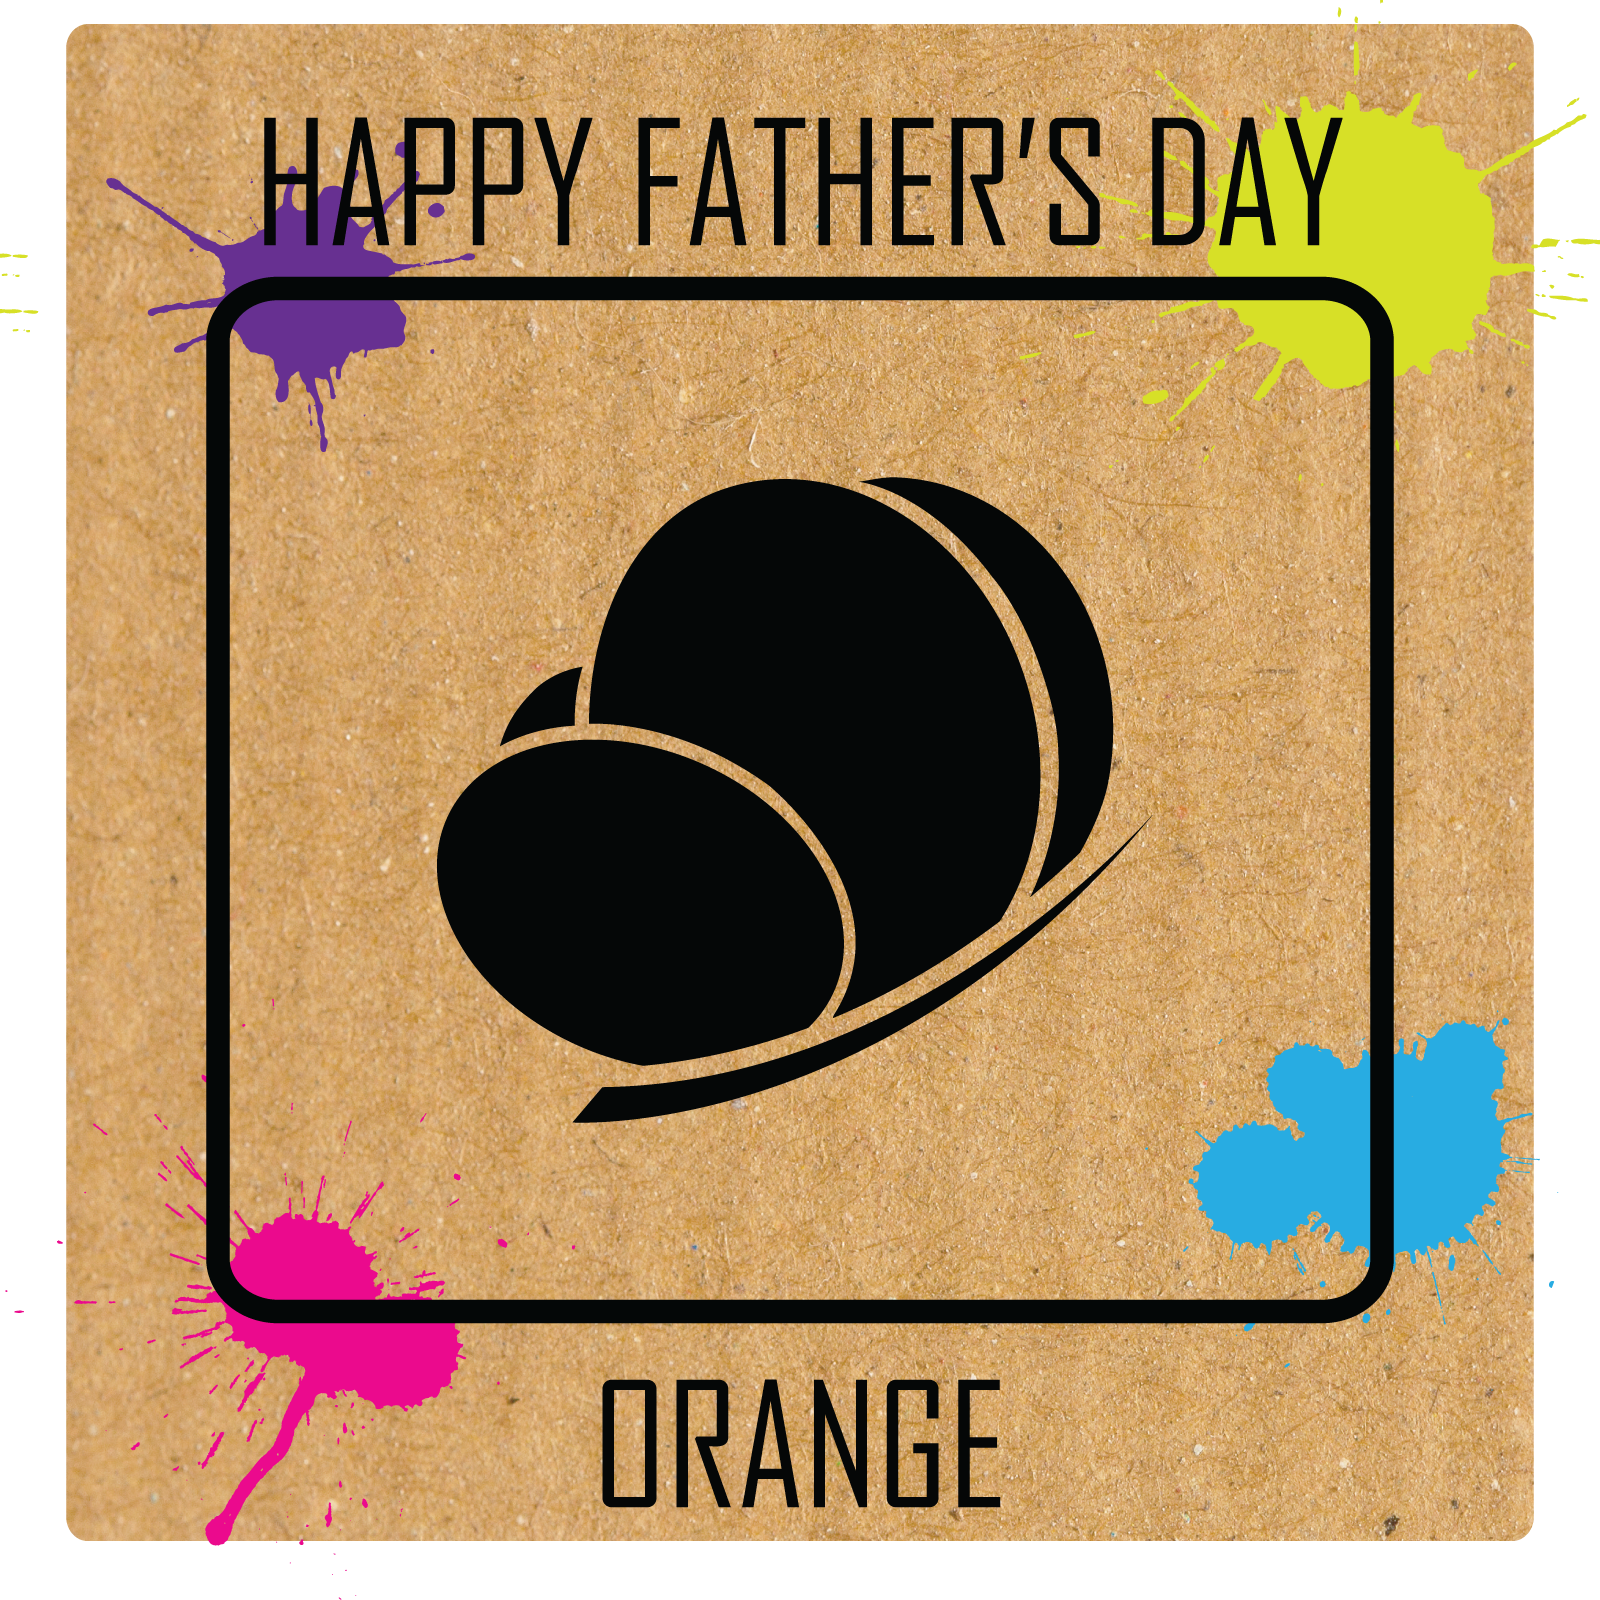 Father's Day Orange 2018